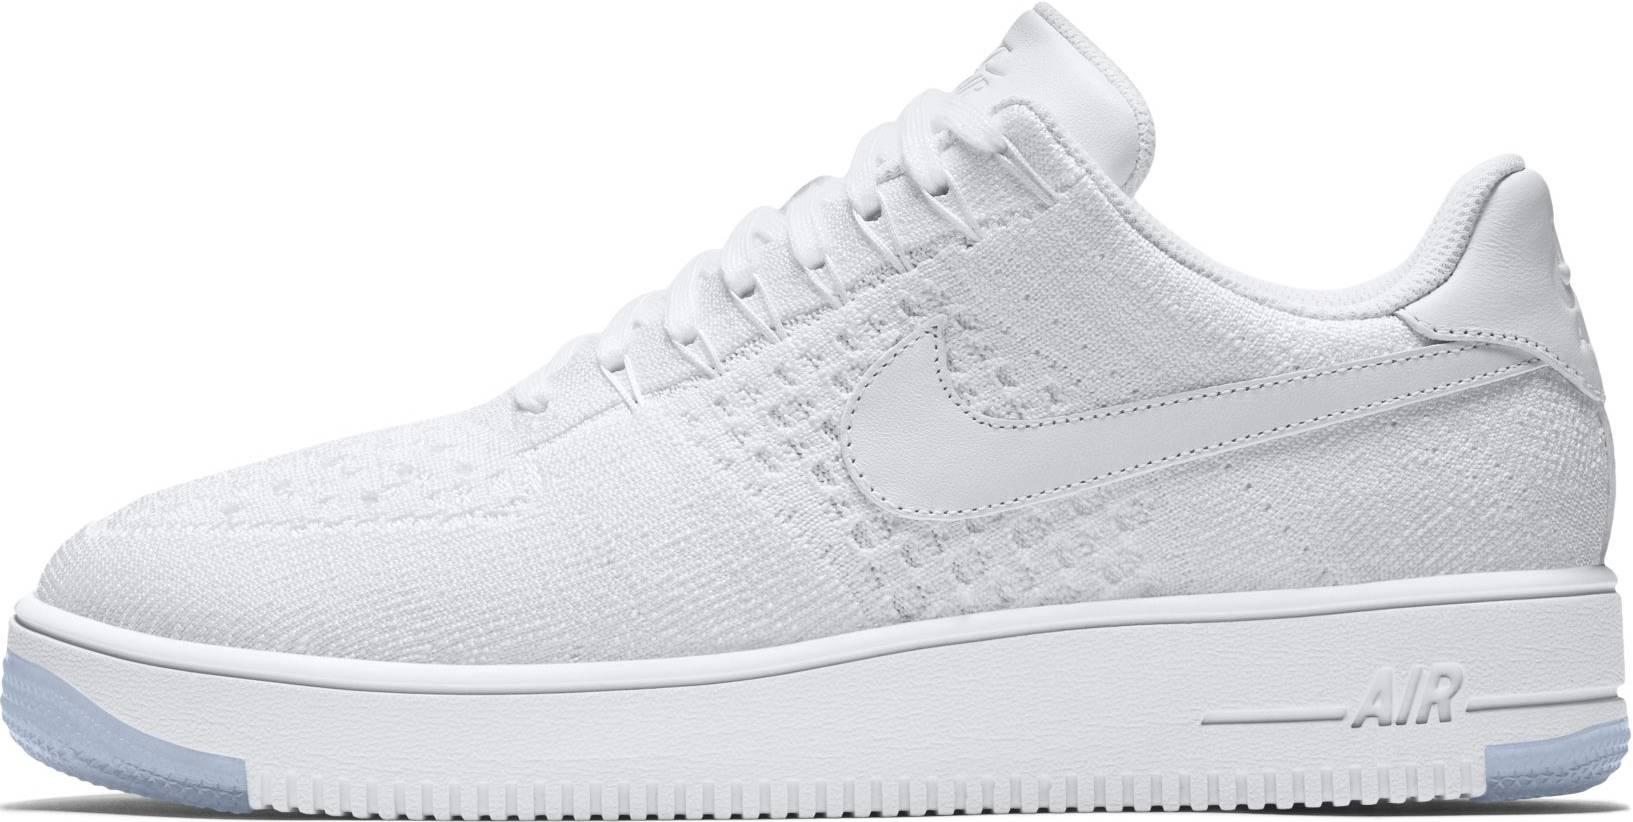 loseta agudo Búsqueda  Nike Air Force 1 Ultra Flyknit Low sneakers in black + white (only $93)    RunRepeat